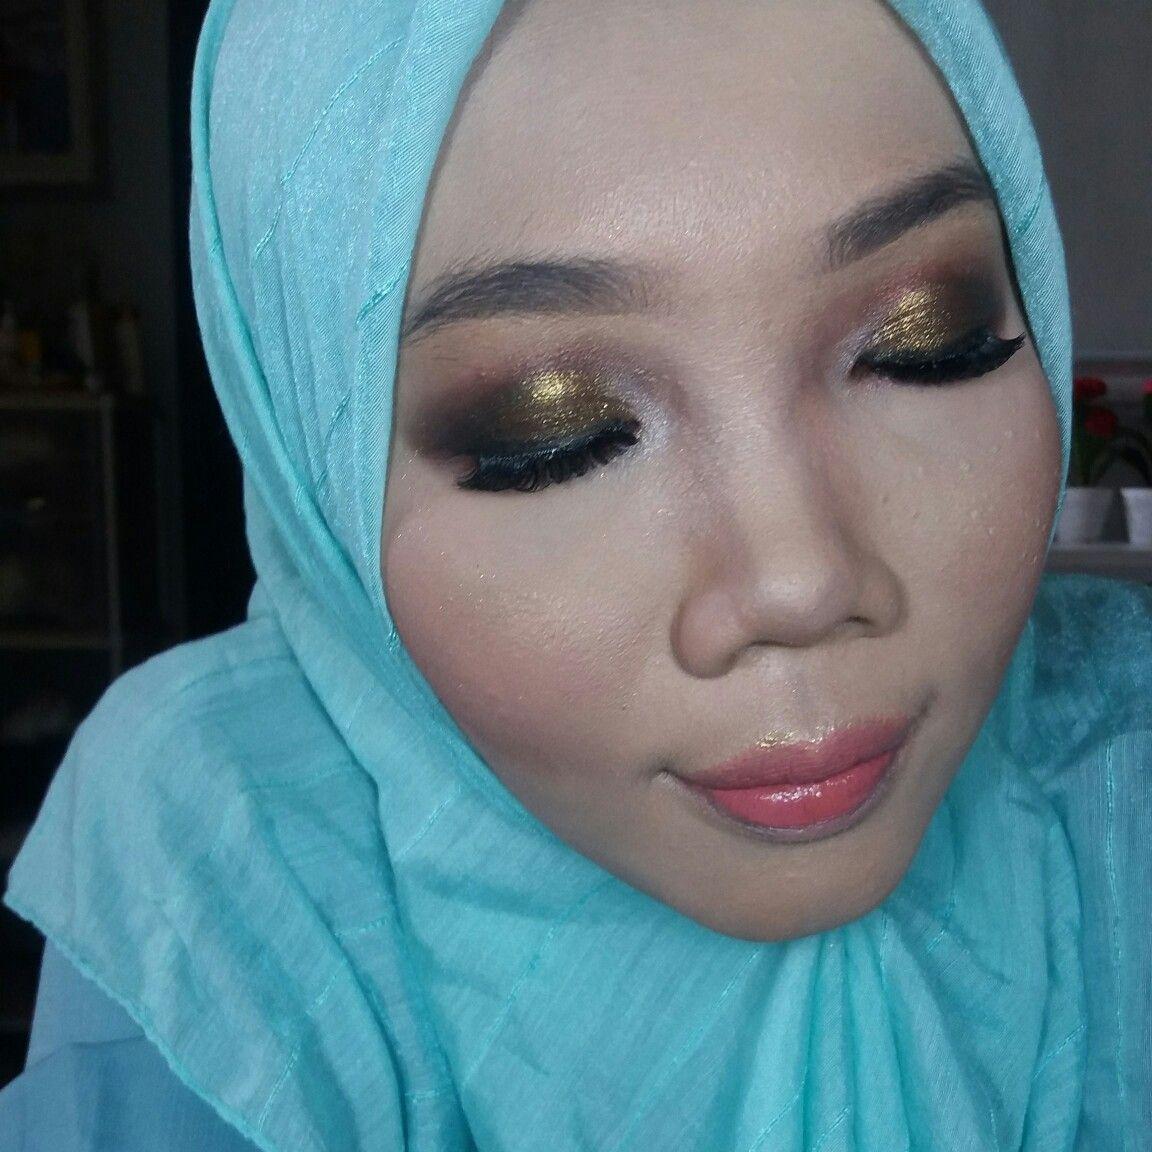 For this makeup, I used gold metallic eyeshadow powder